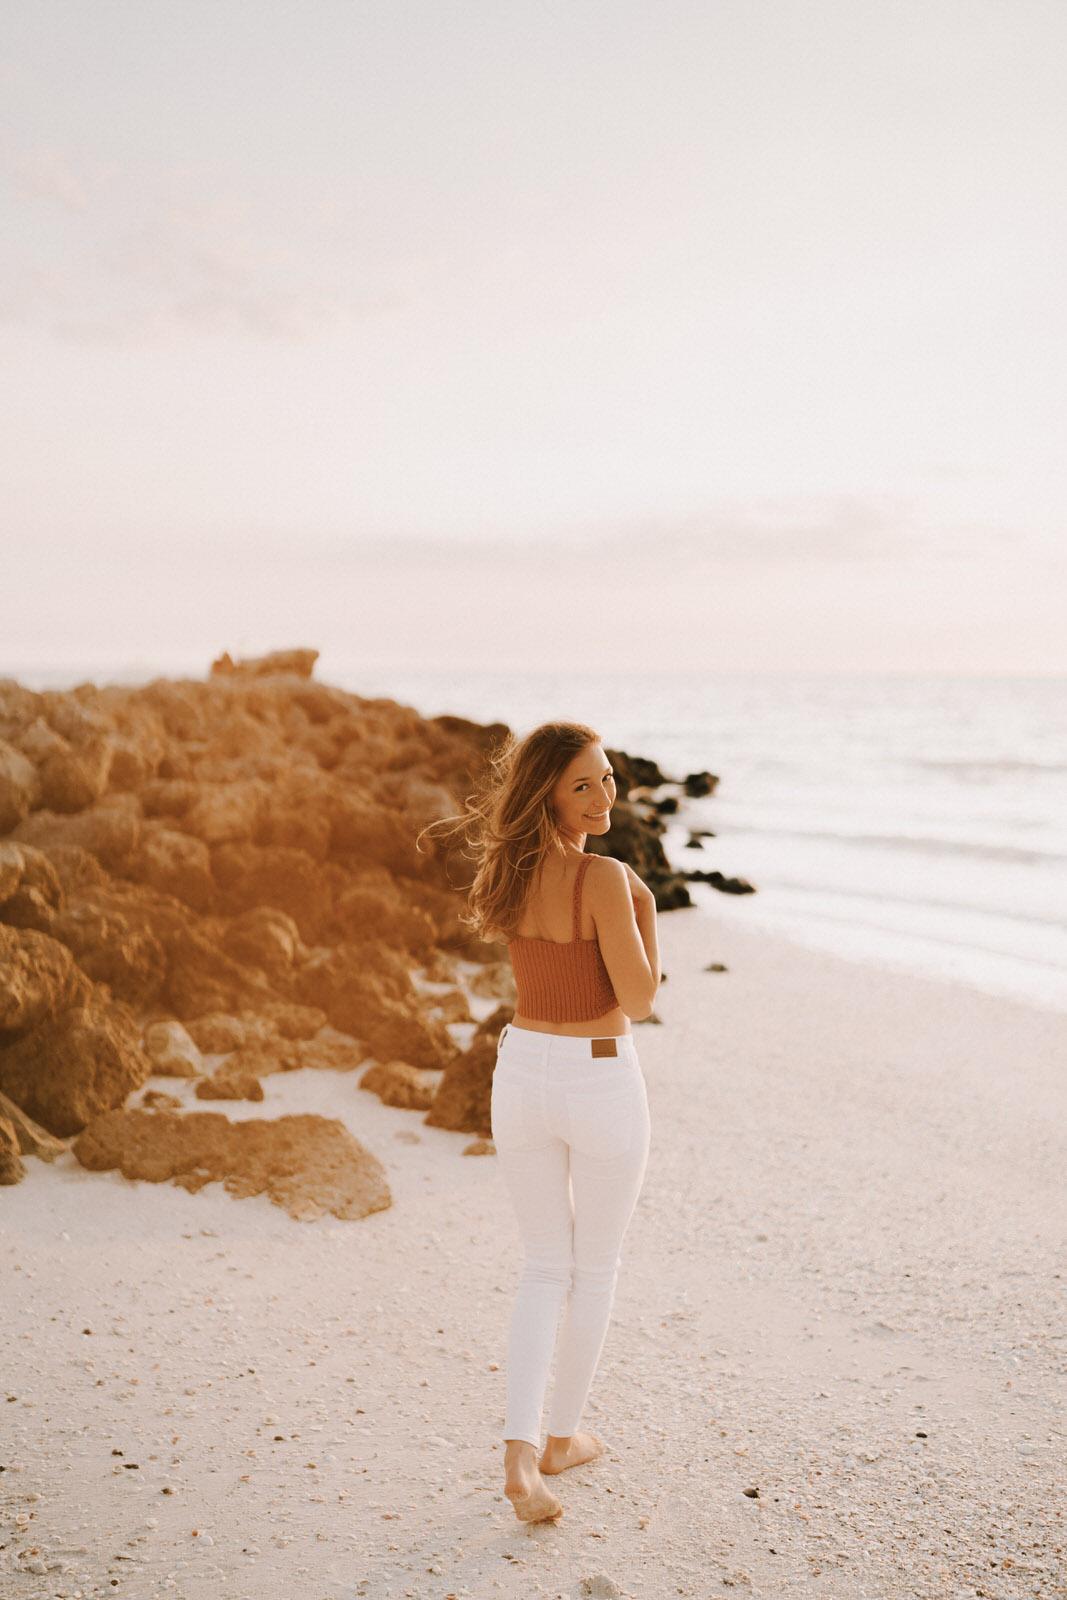 Fort Myers Senior Photos on Bonita Beach - Michelle Gonzalez Photography - Sammie-116.JPG